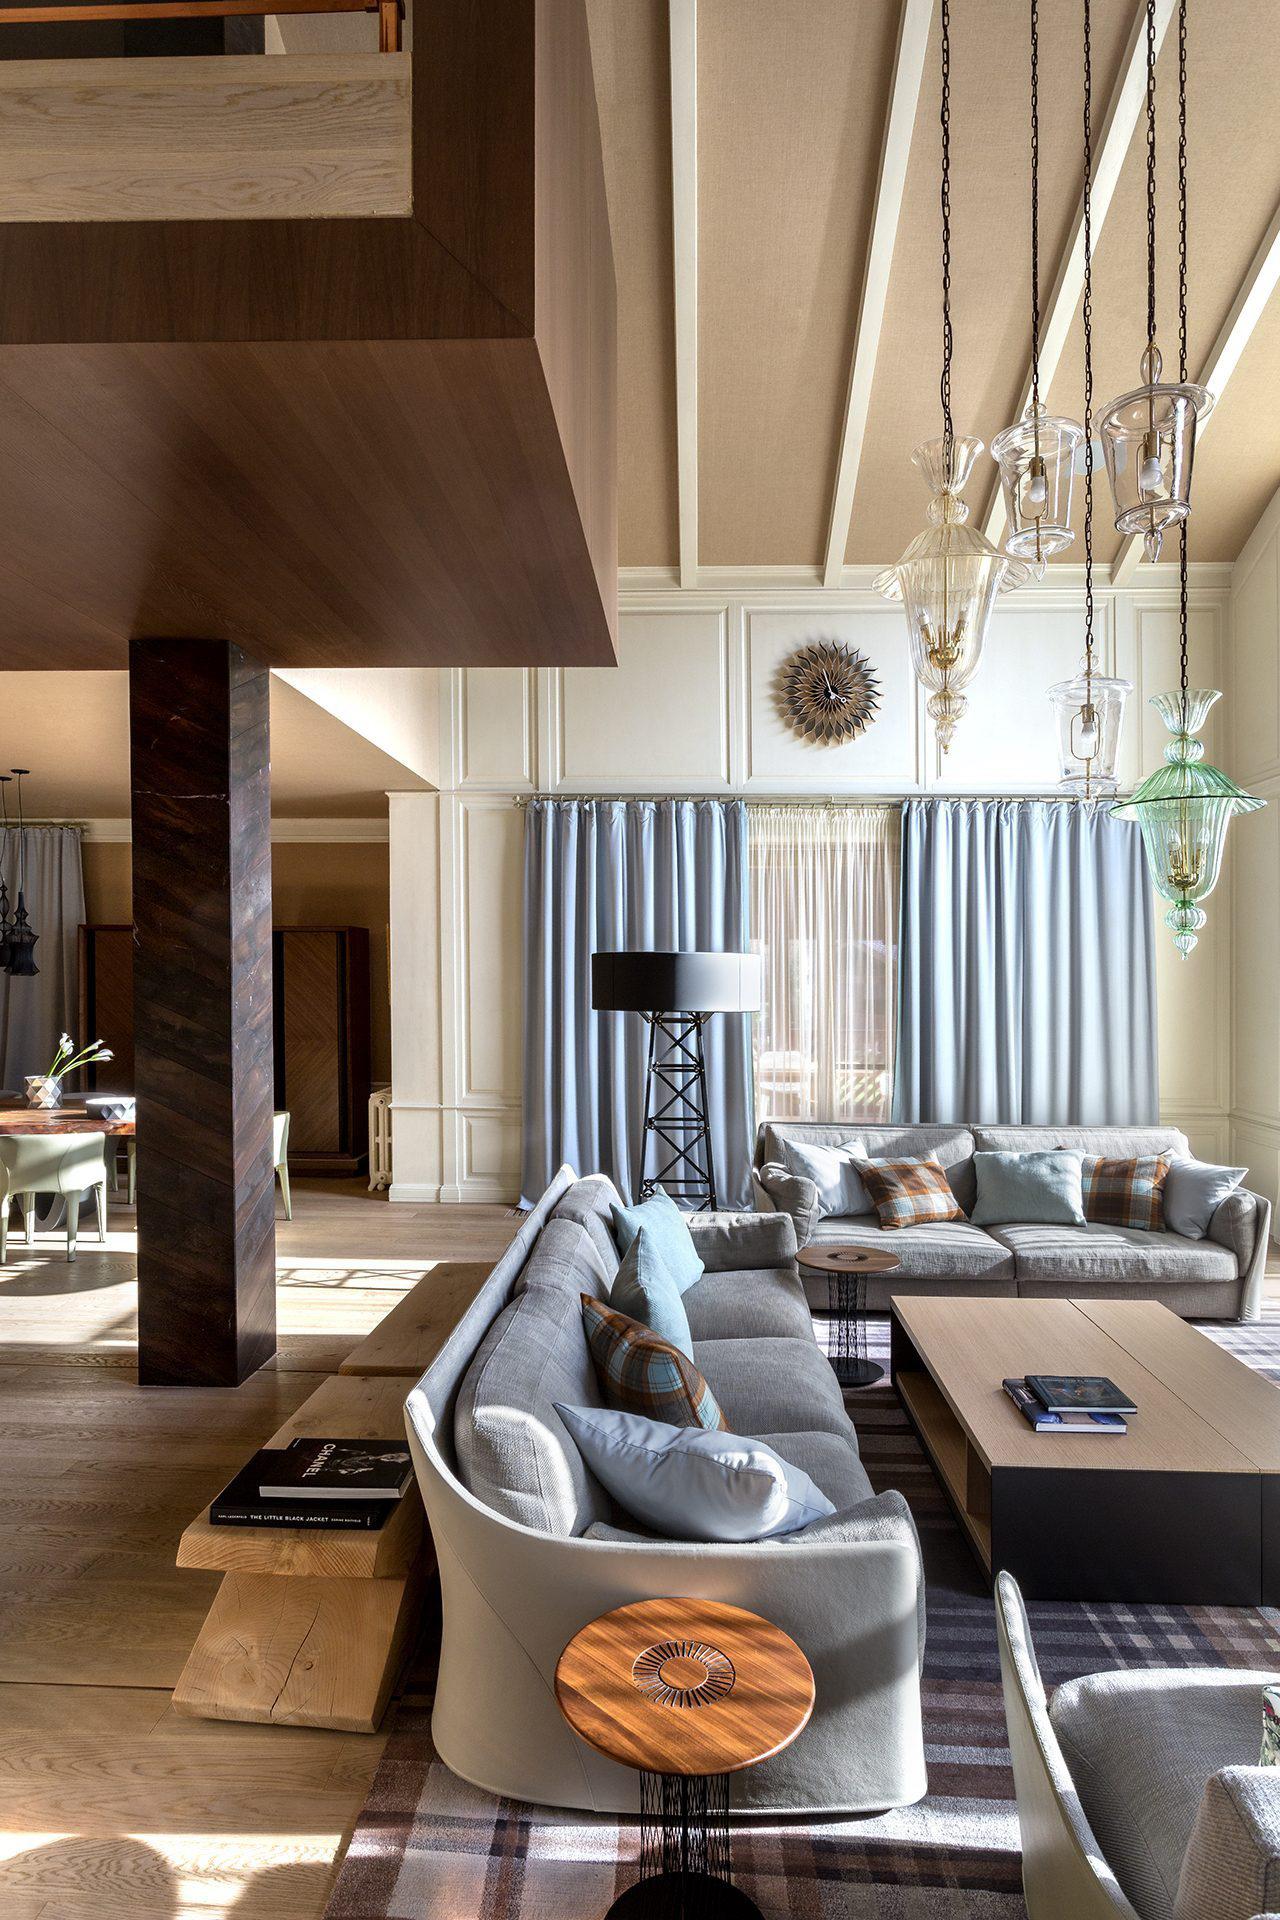 Maison de Charme Interior Design Kiev, Ukraine – Elena Dobrovolska